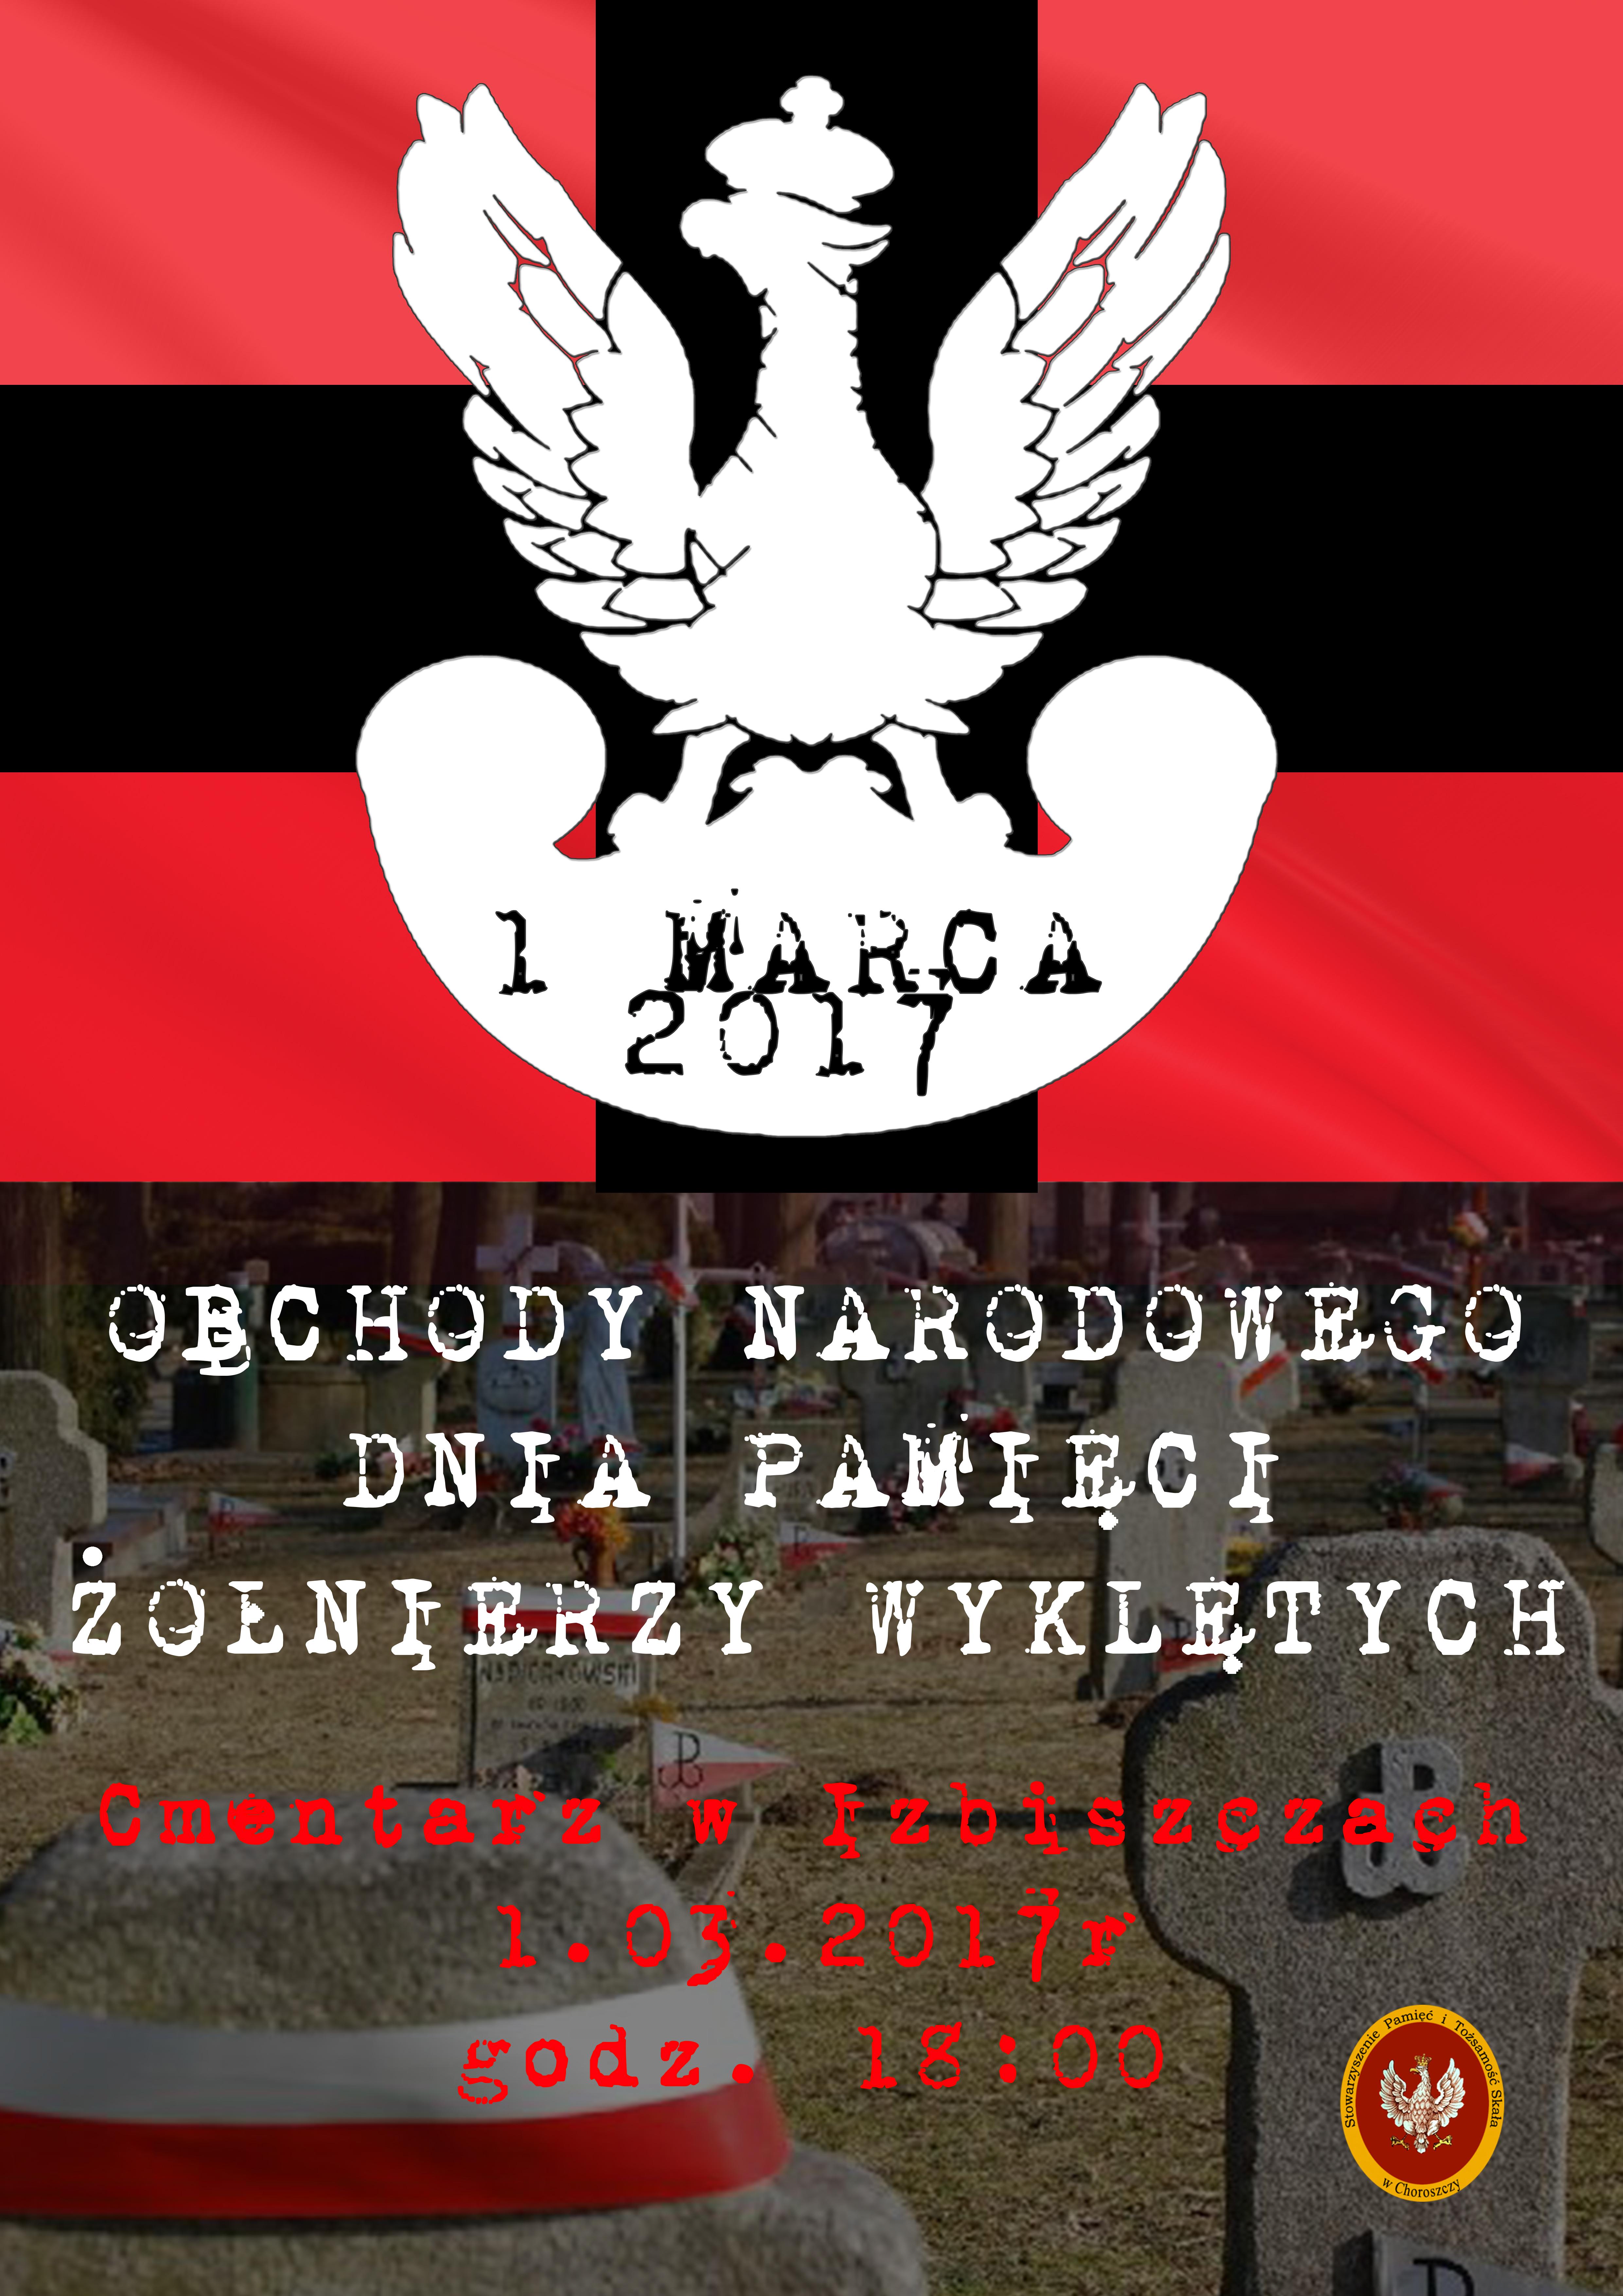 plakat 1 marca 17